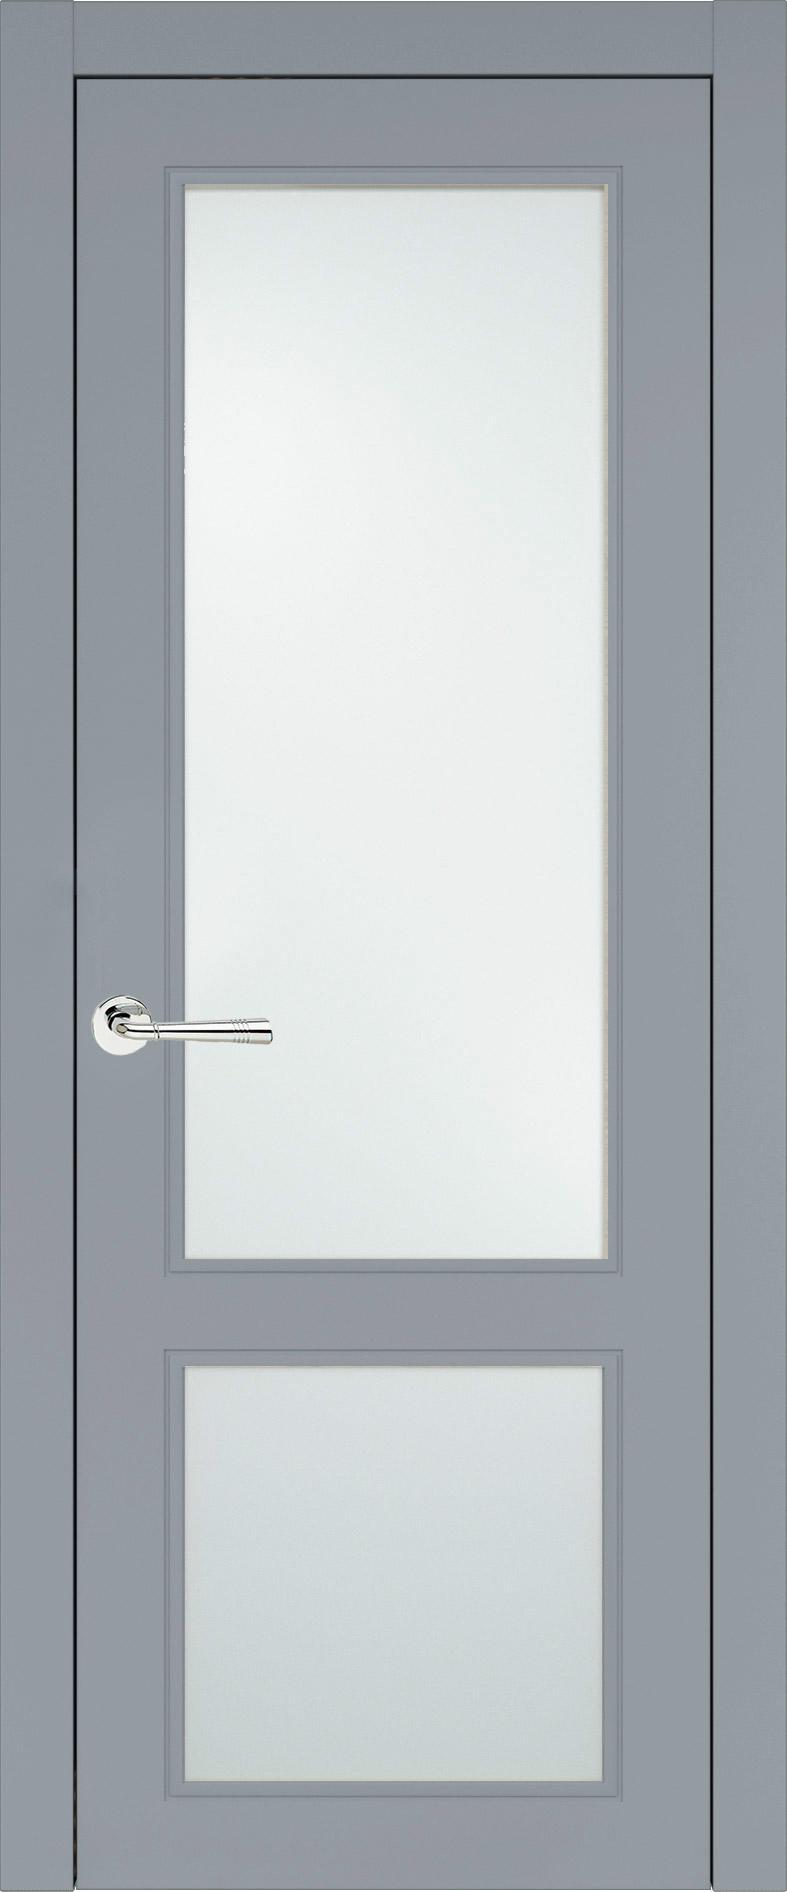 Dinastia Neo Classic цвет - Серебристо-серая эмаль (RAL 7045) Со стеклом (ДО)